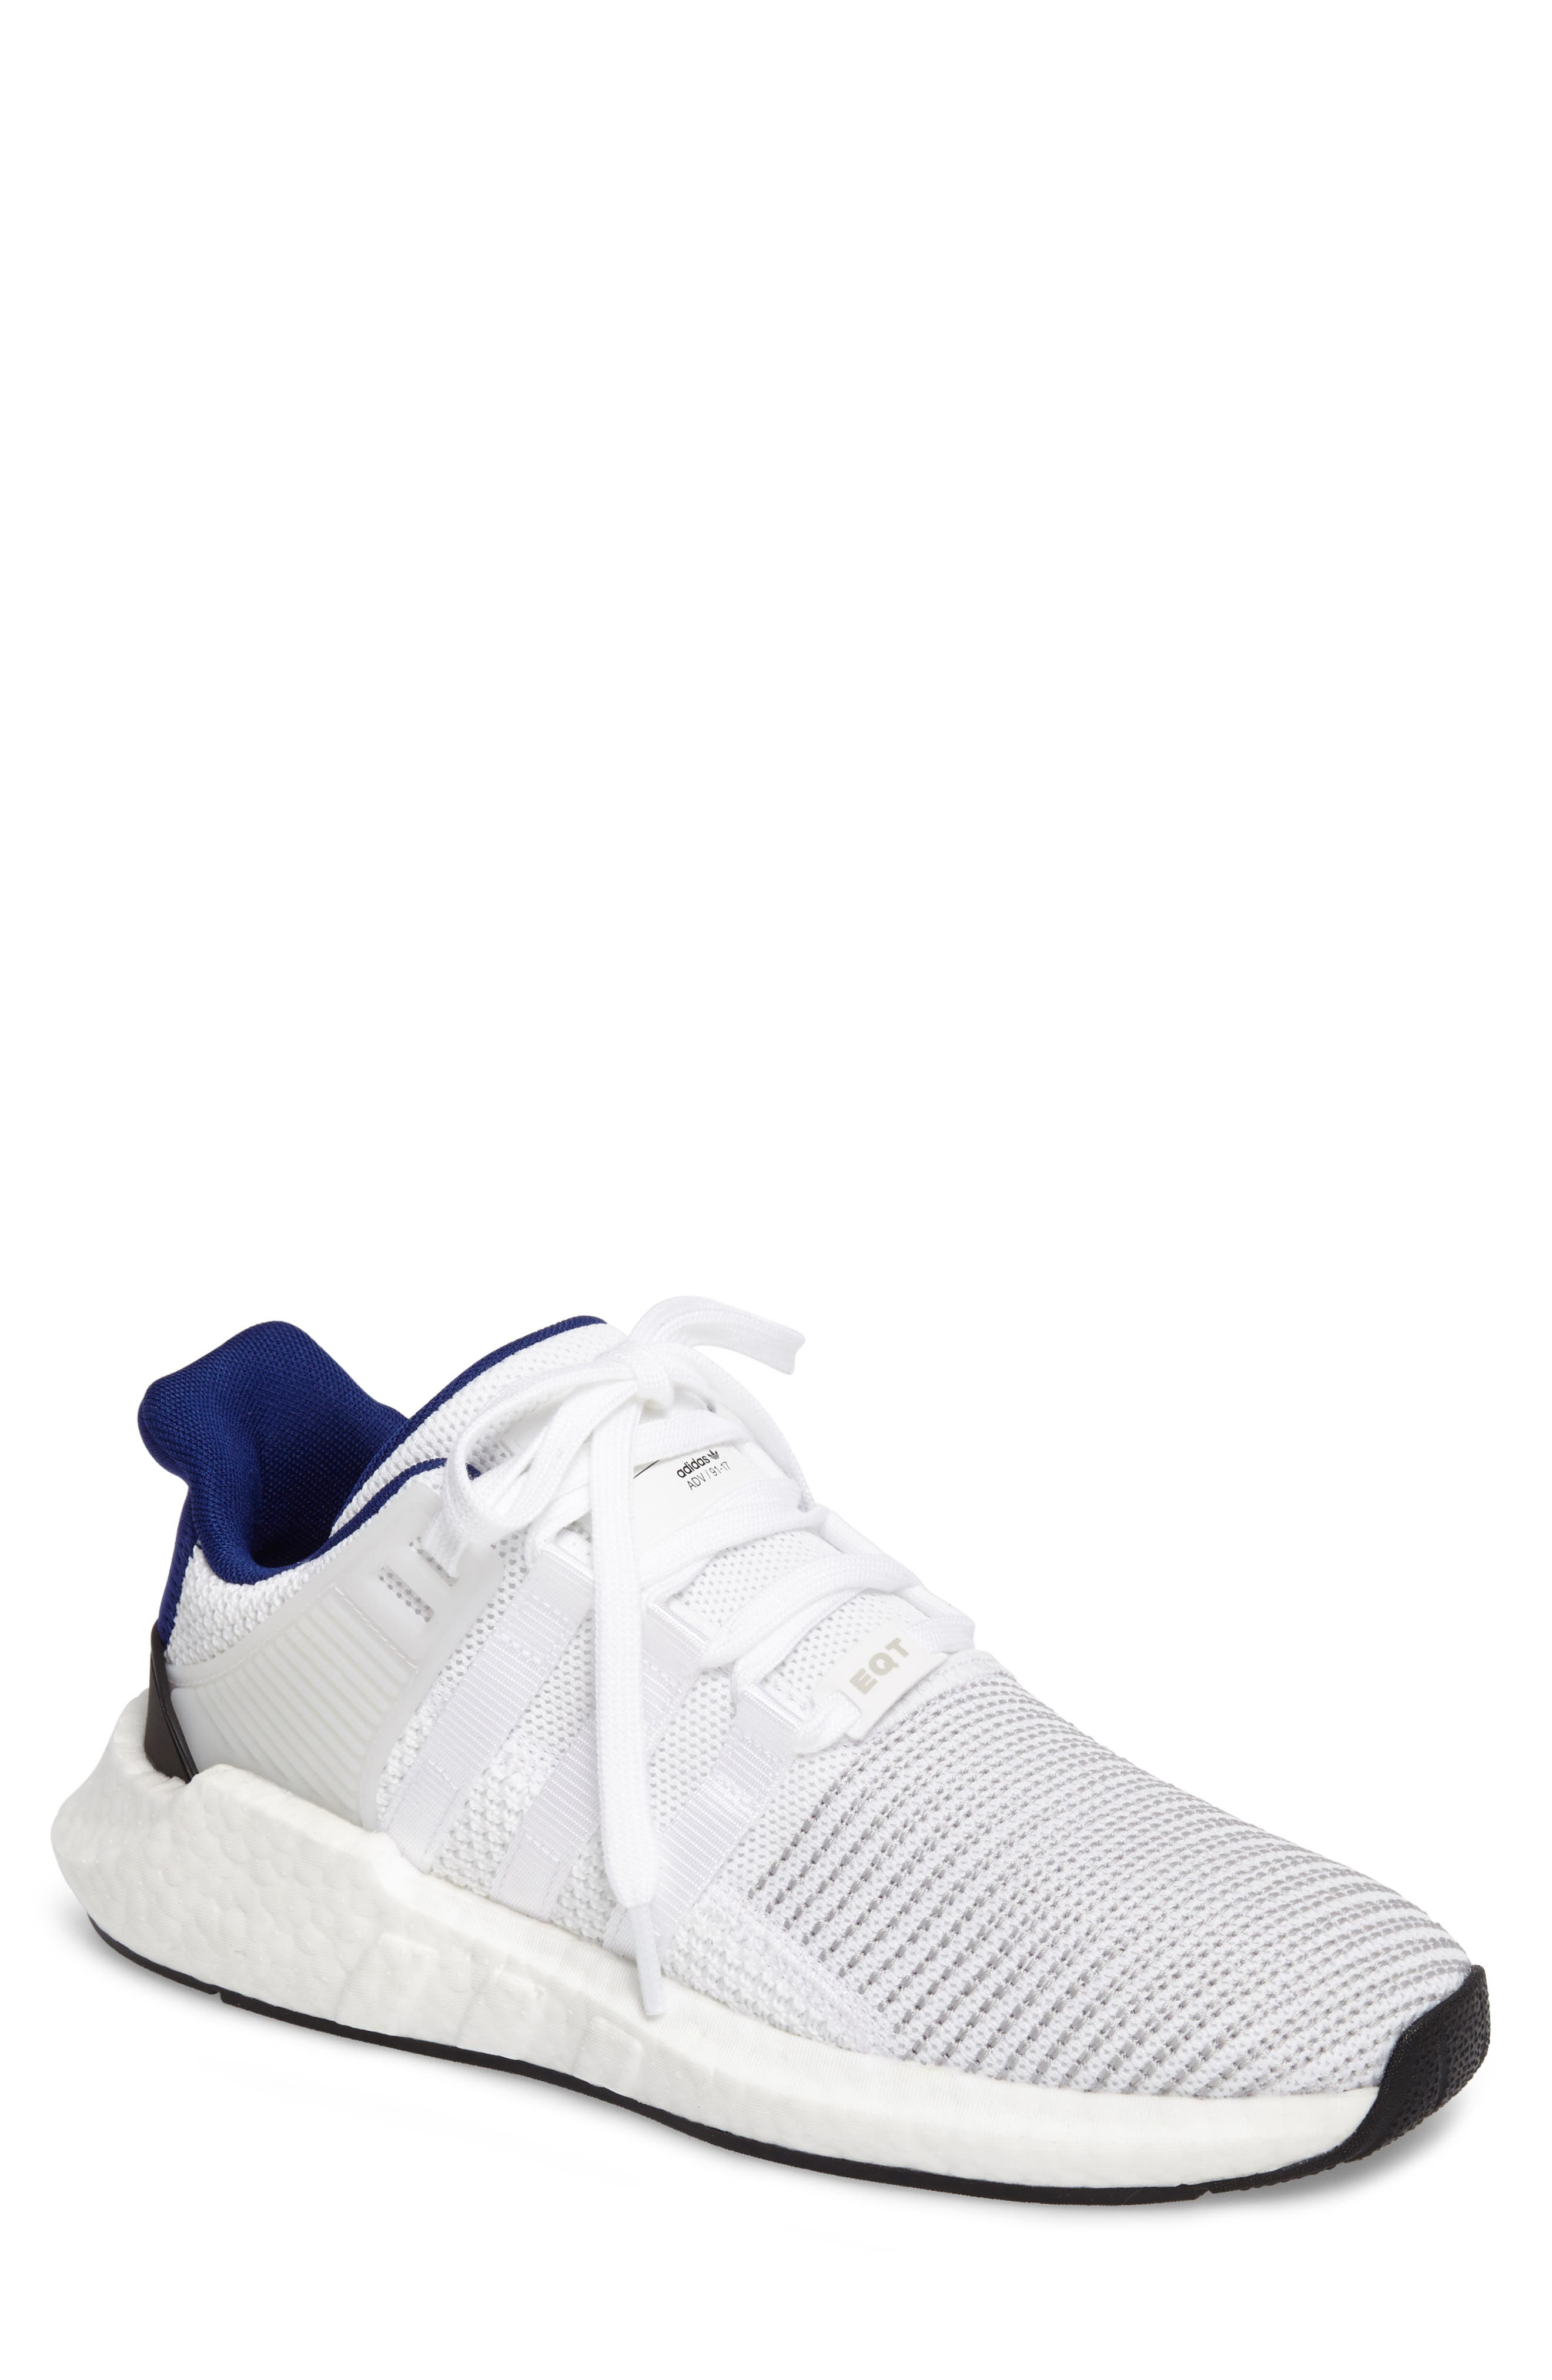 EQT Support 93/17 Sneaker,                             Main thumbnail 1, color,                             White/ White/ Core Black